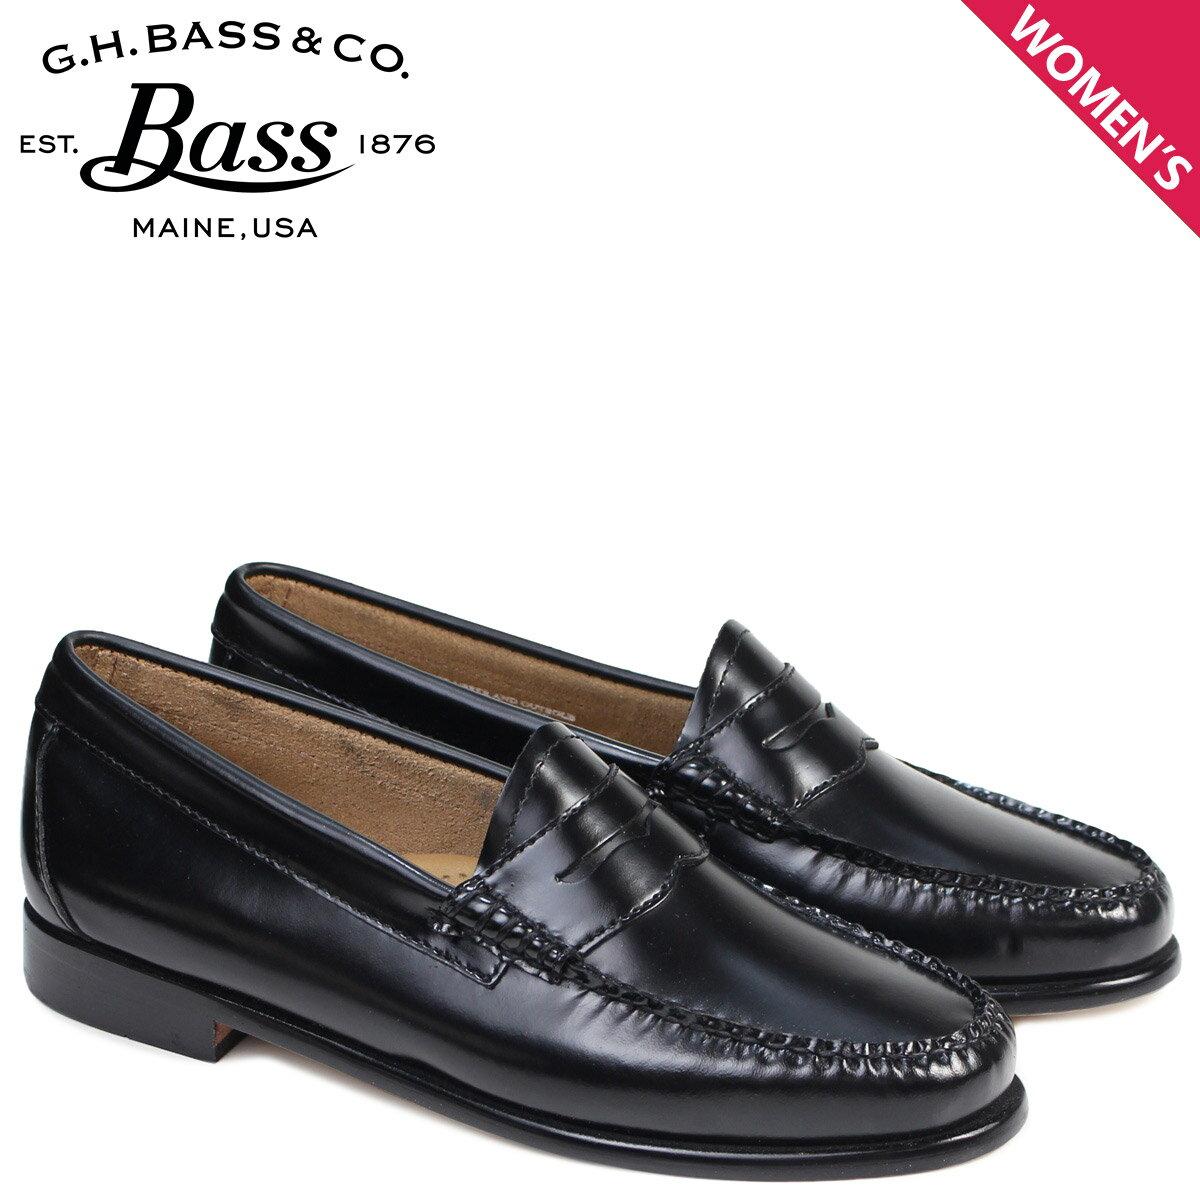 G.H. BASS ローファー ジーエイチバス レディース ペニー WHITNEY WEEJUNS 71-10334 靴 ブラック